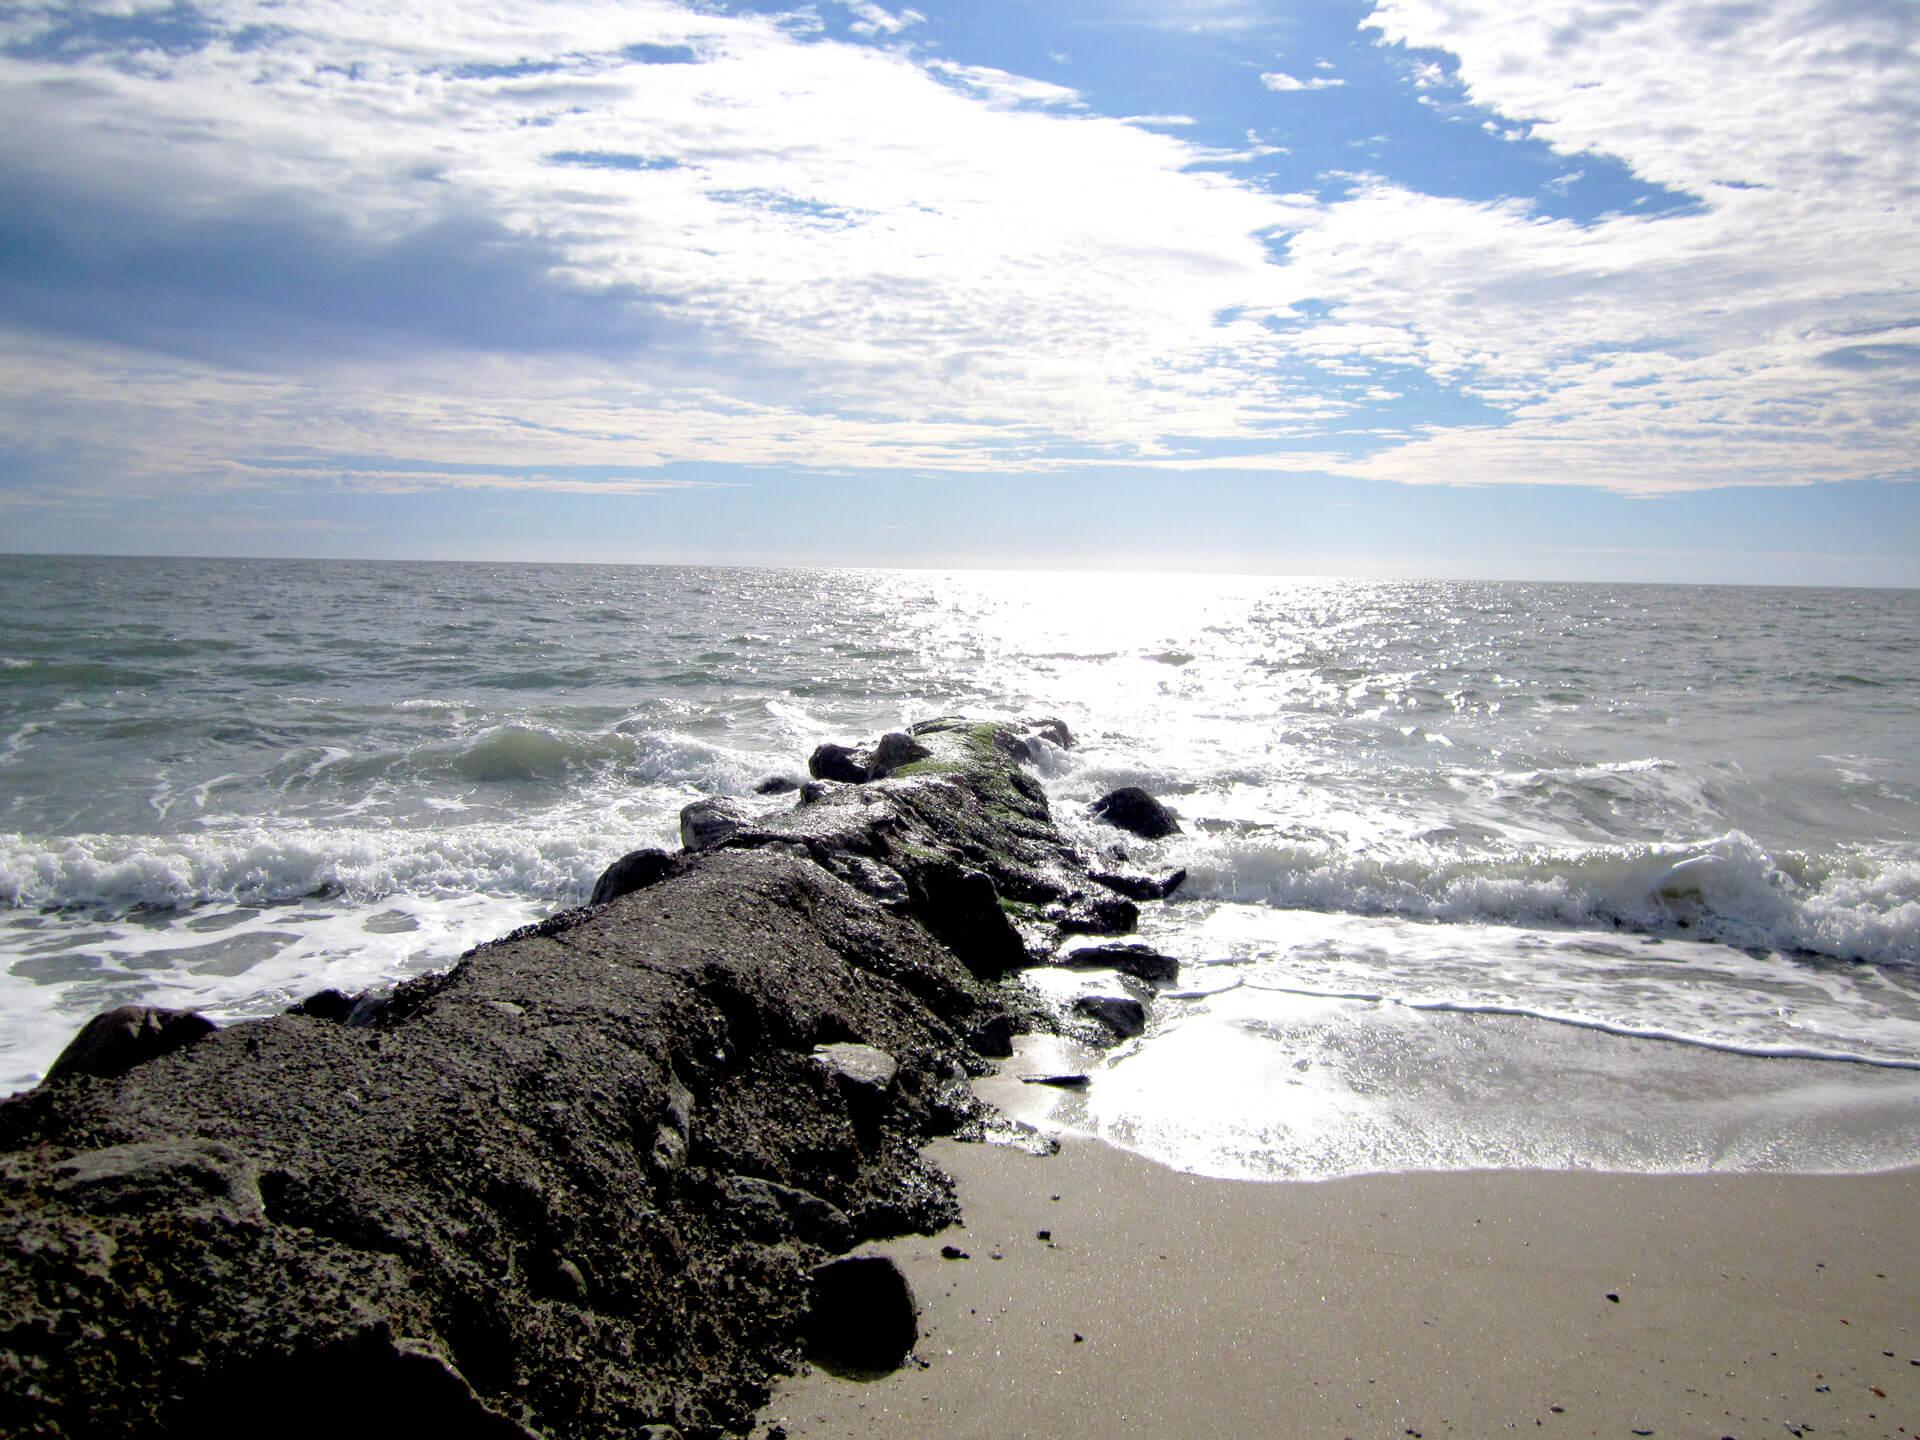 sullivans island fishing spots